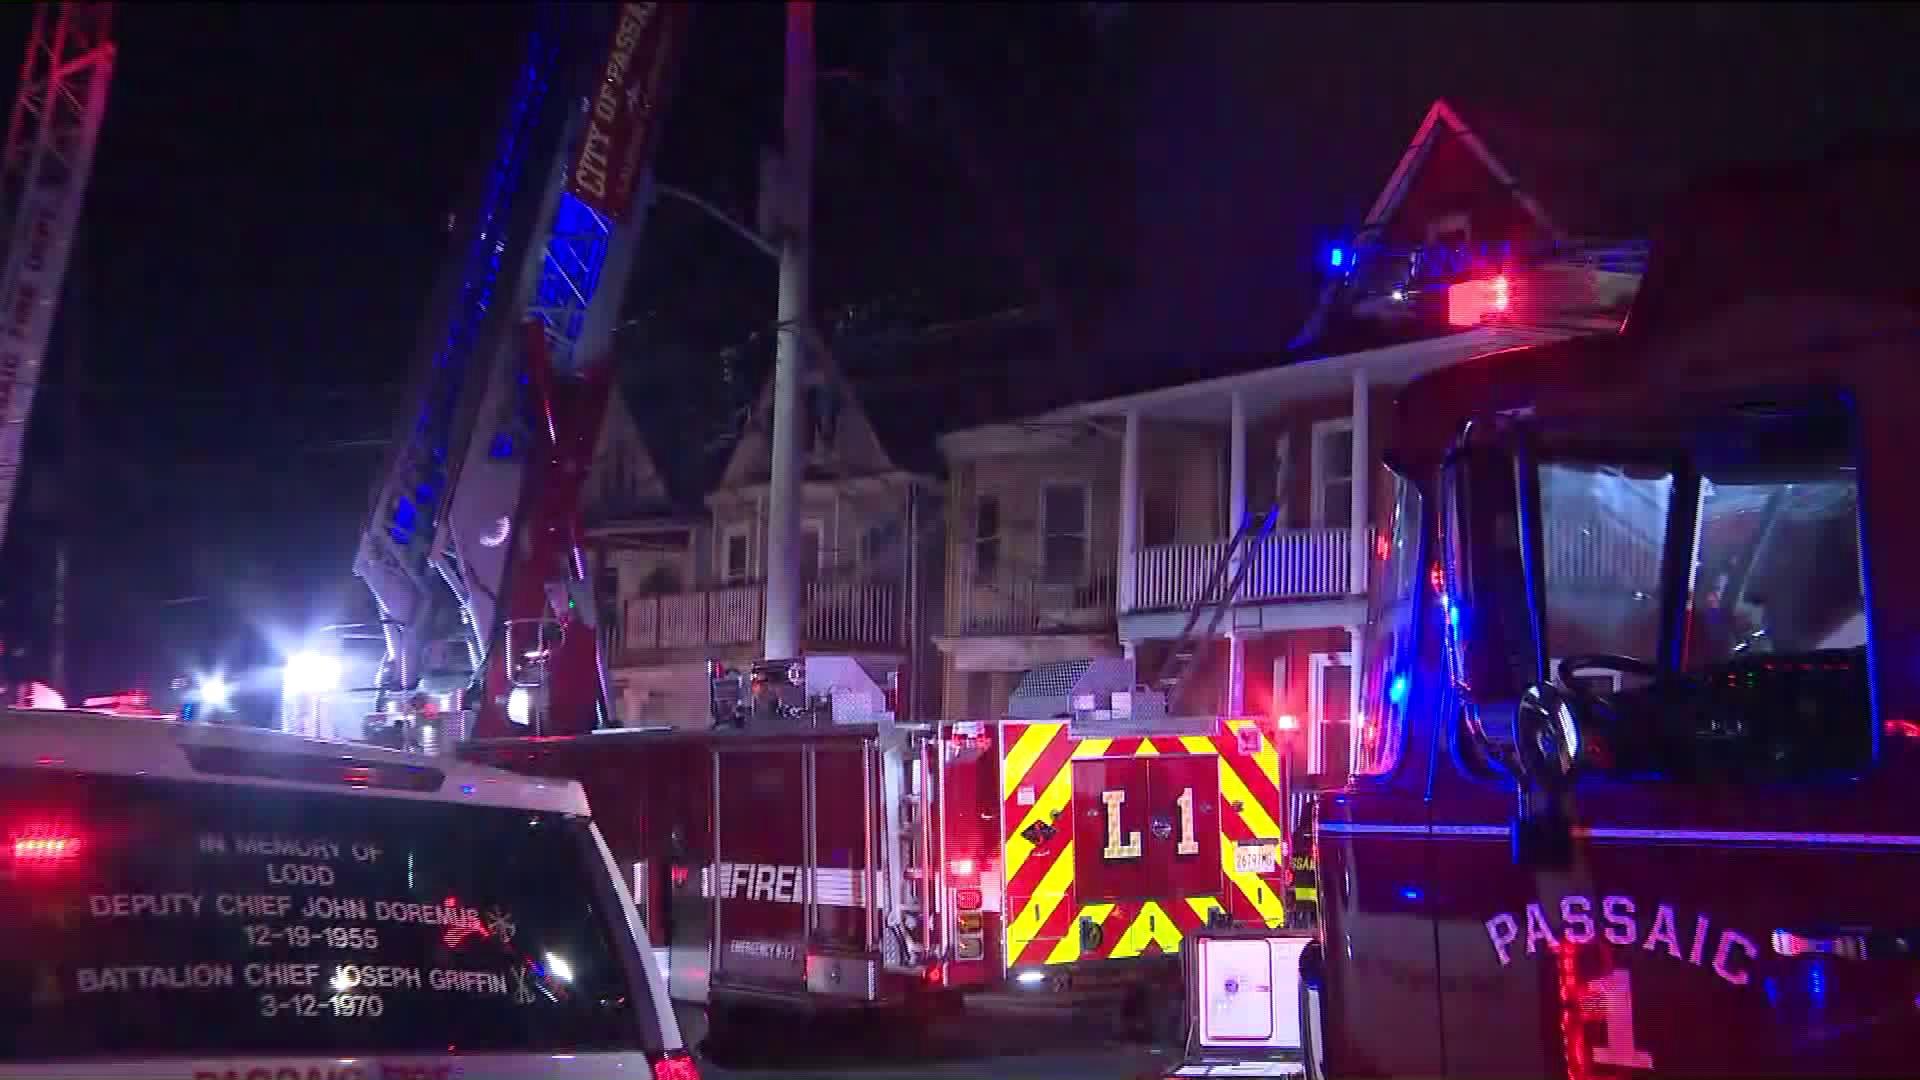 Passaic three-alarm house fire in New Jersey